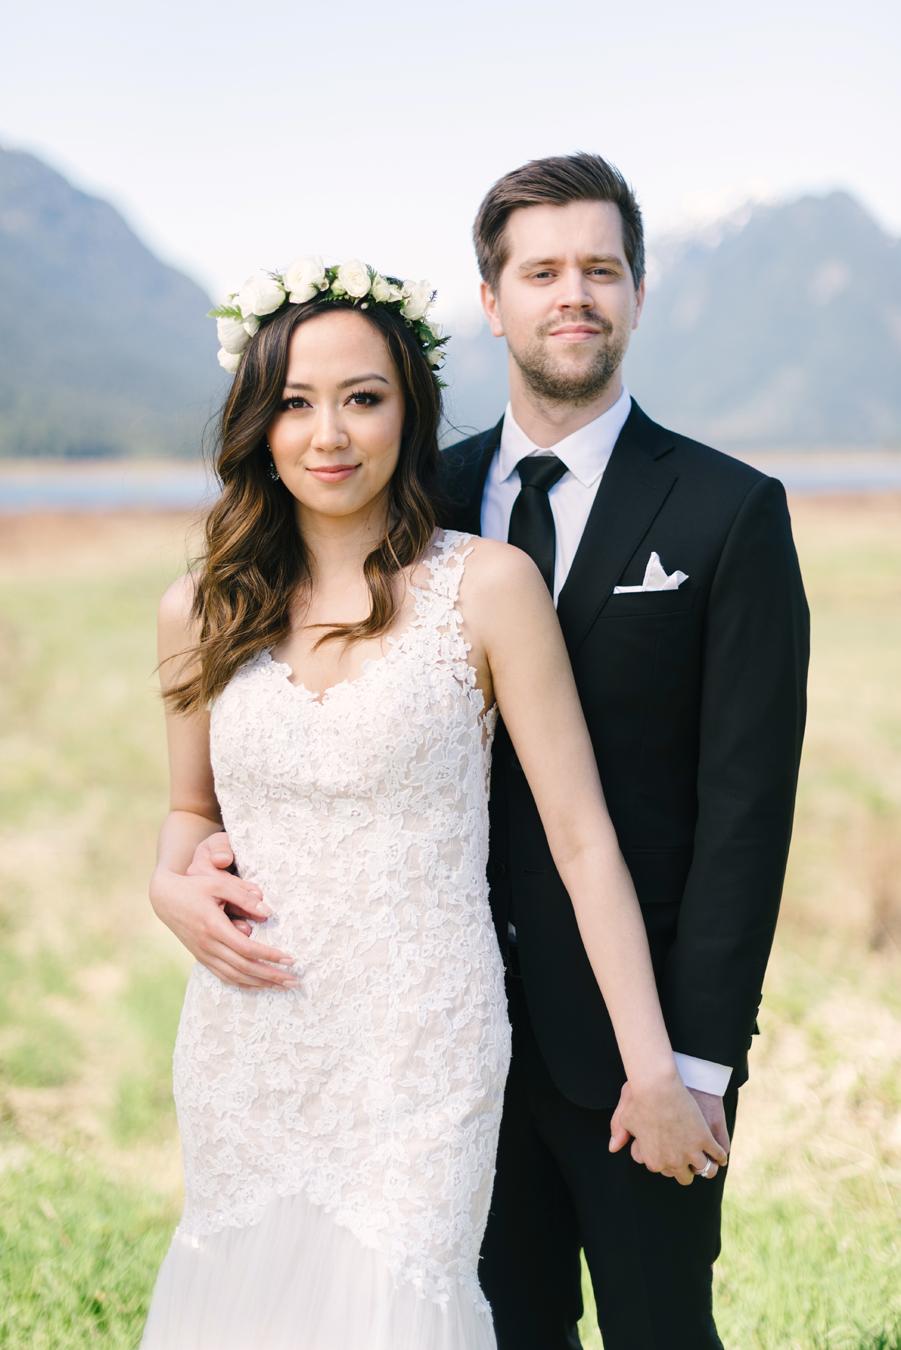 vanouver-wedding-portraits-19.jpg